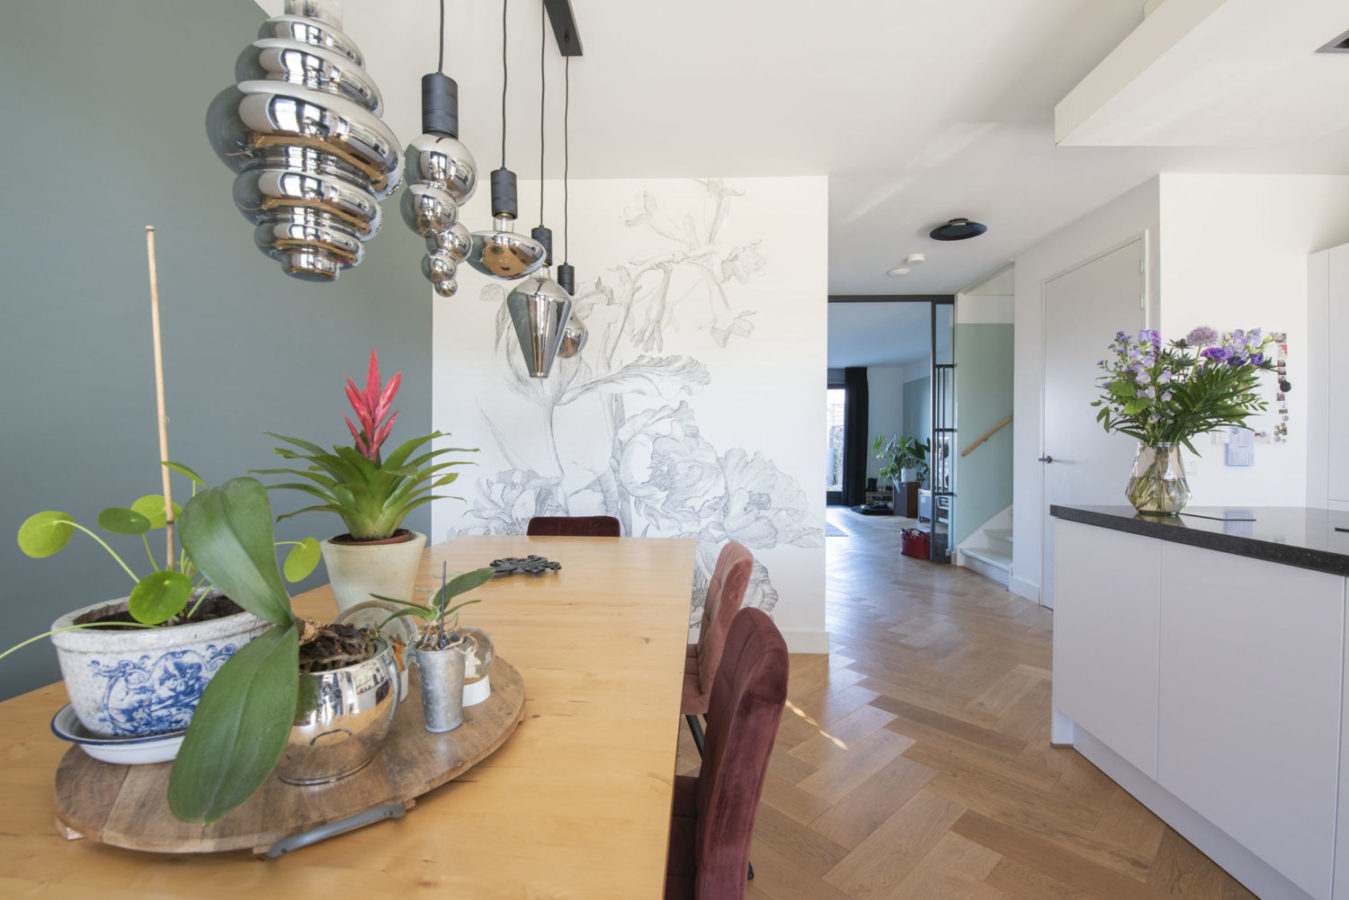 Keuken Teteringen interieurontwerp interieuradvies breda styling binnenhuisarchitect